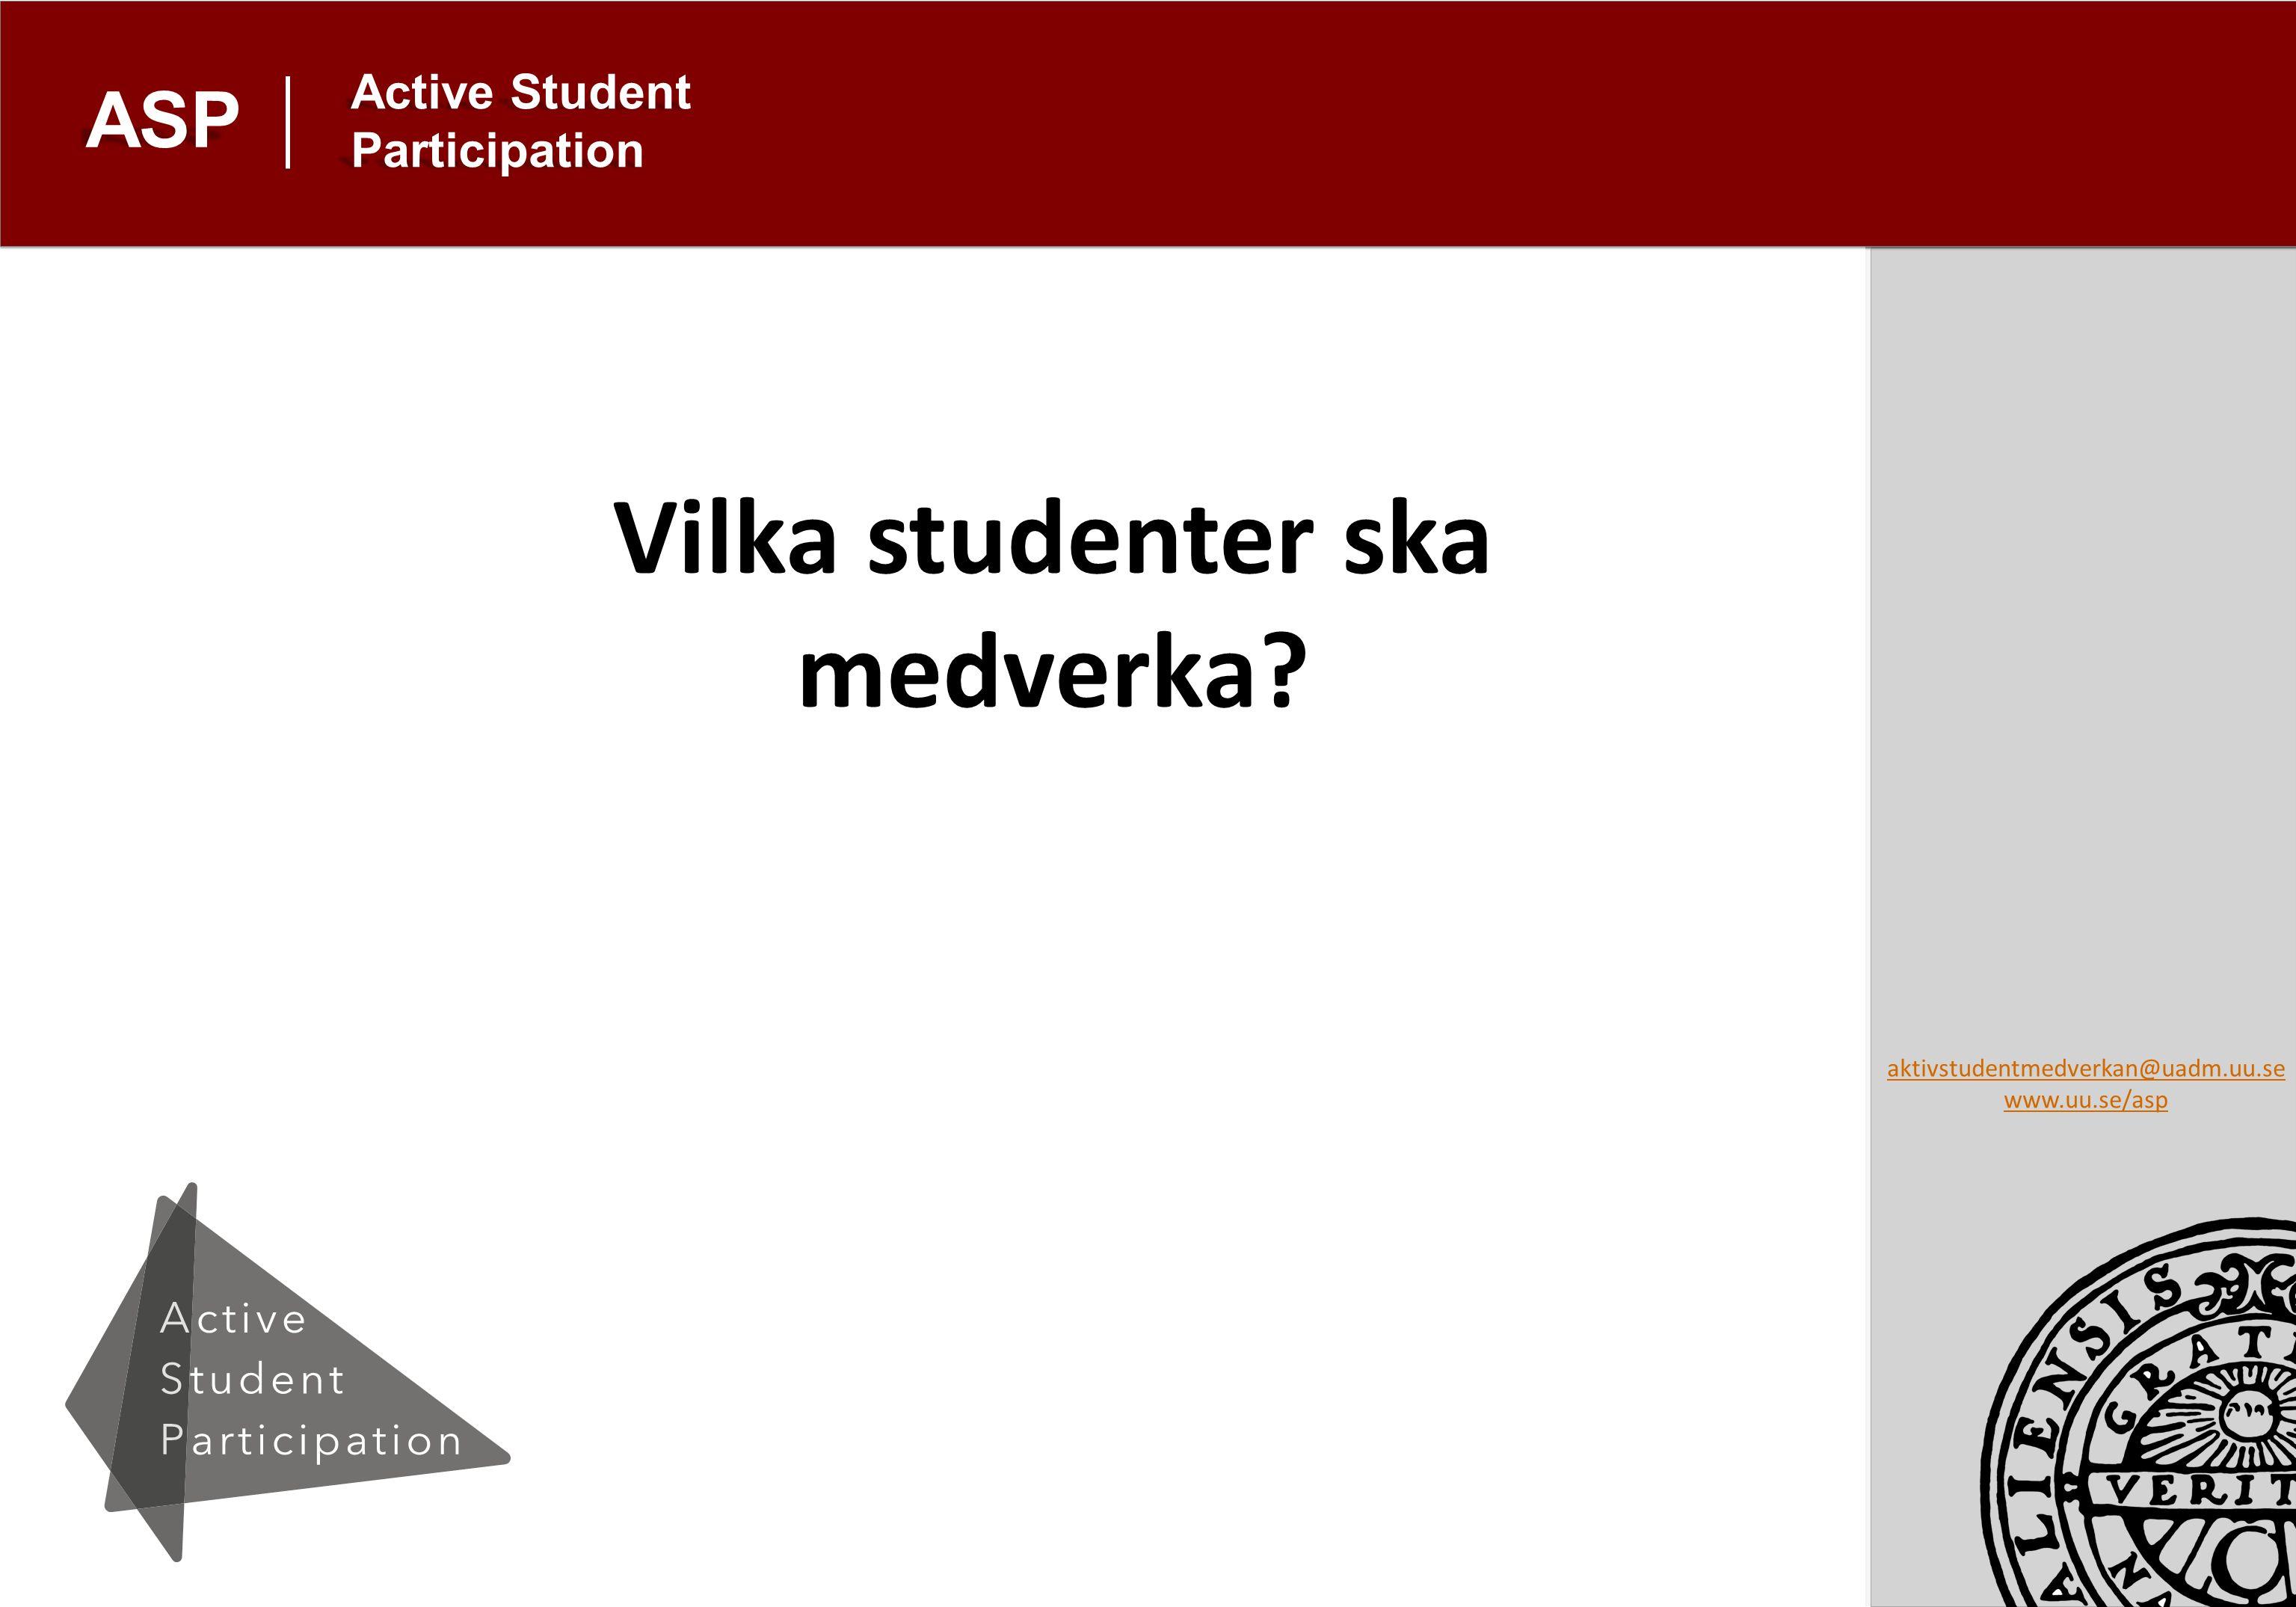 aktivstudentmedverkan@uadm.uu.se www.uu.se/asp Active Student Participation ASP Vilka studenter ska medverka